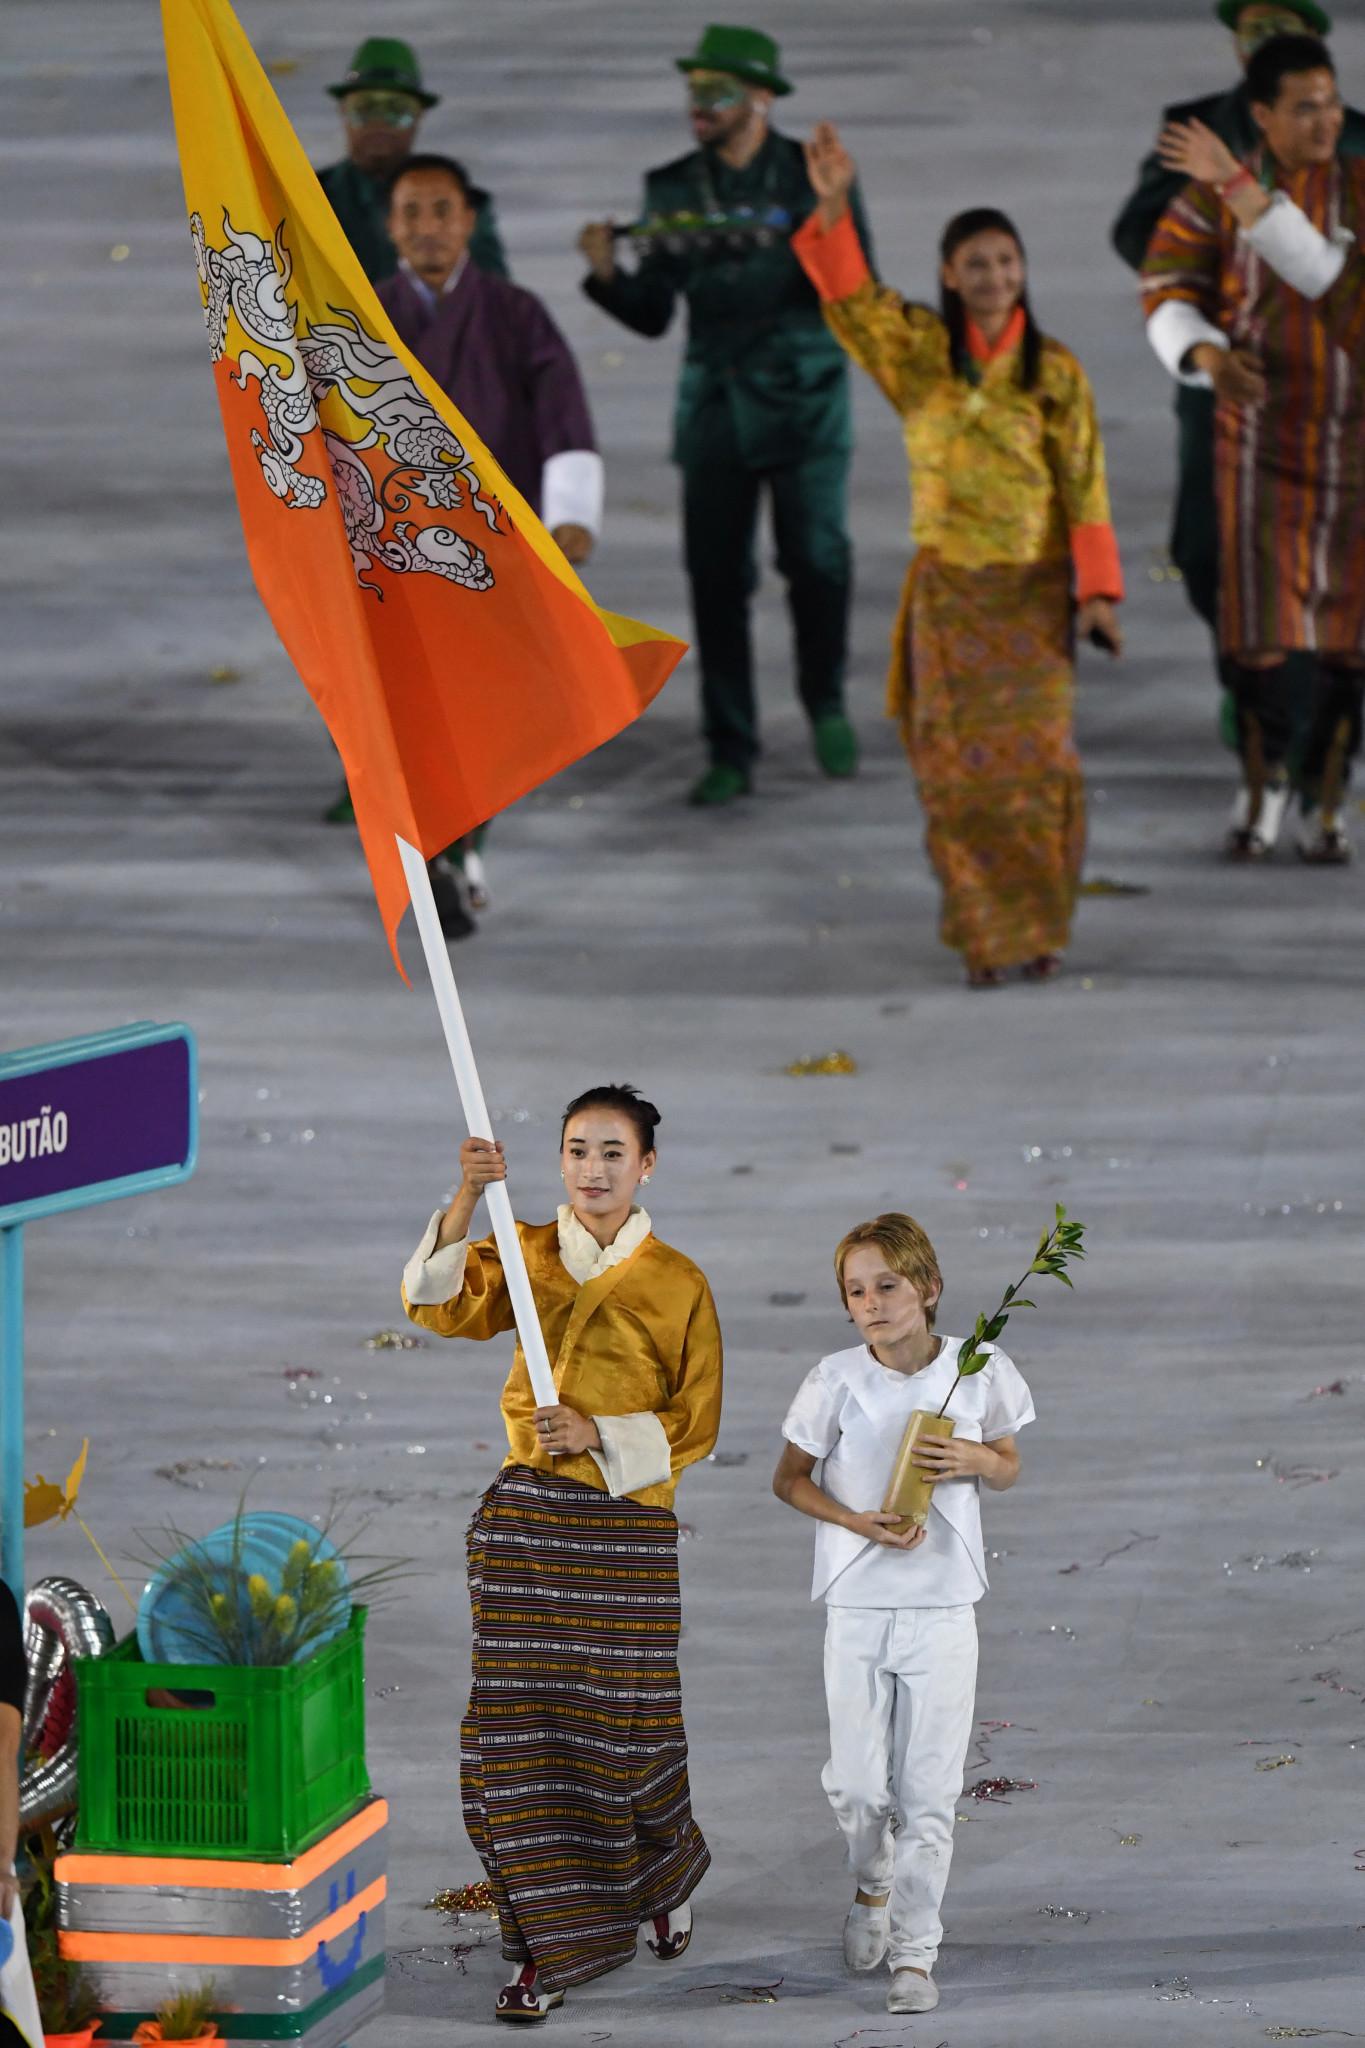 Karma Karma carries the Bhutan flag at Rio 2016 ©Getty Images